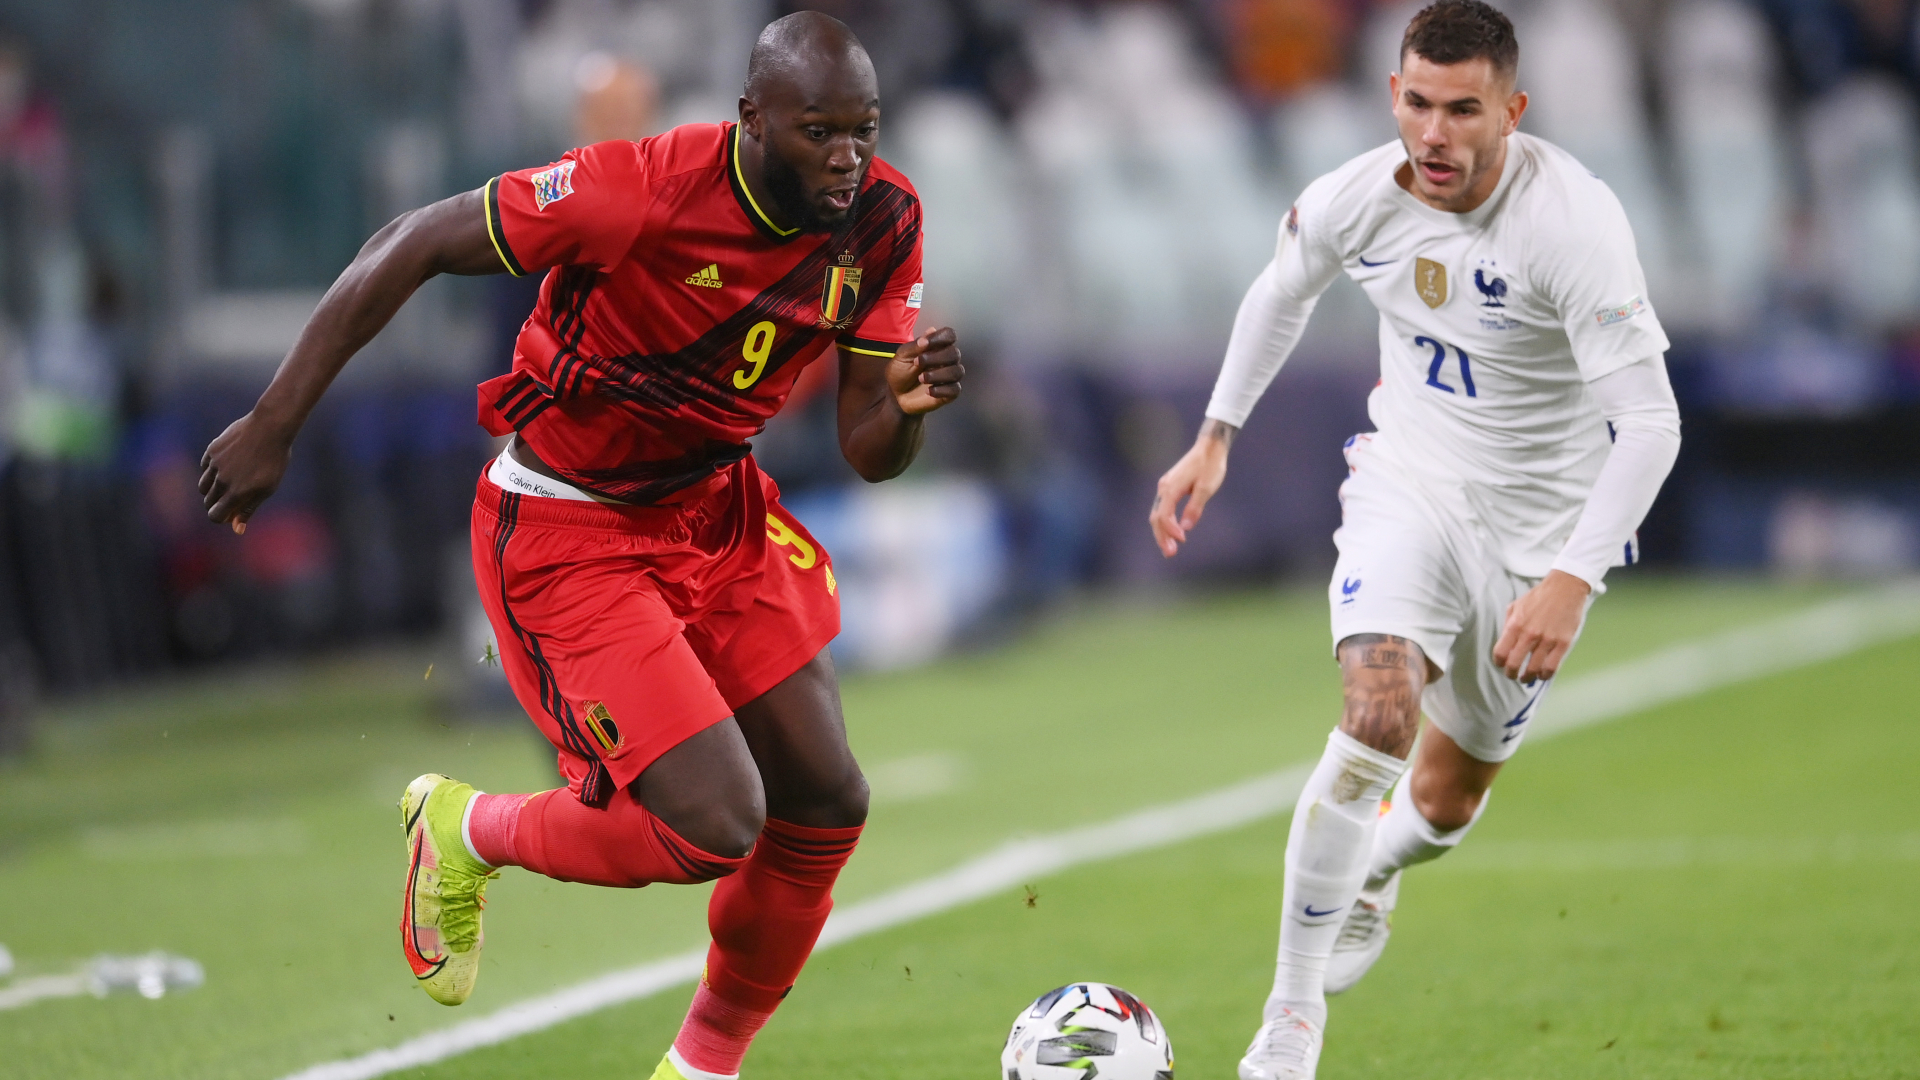 LIVE: Belgium vs France